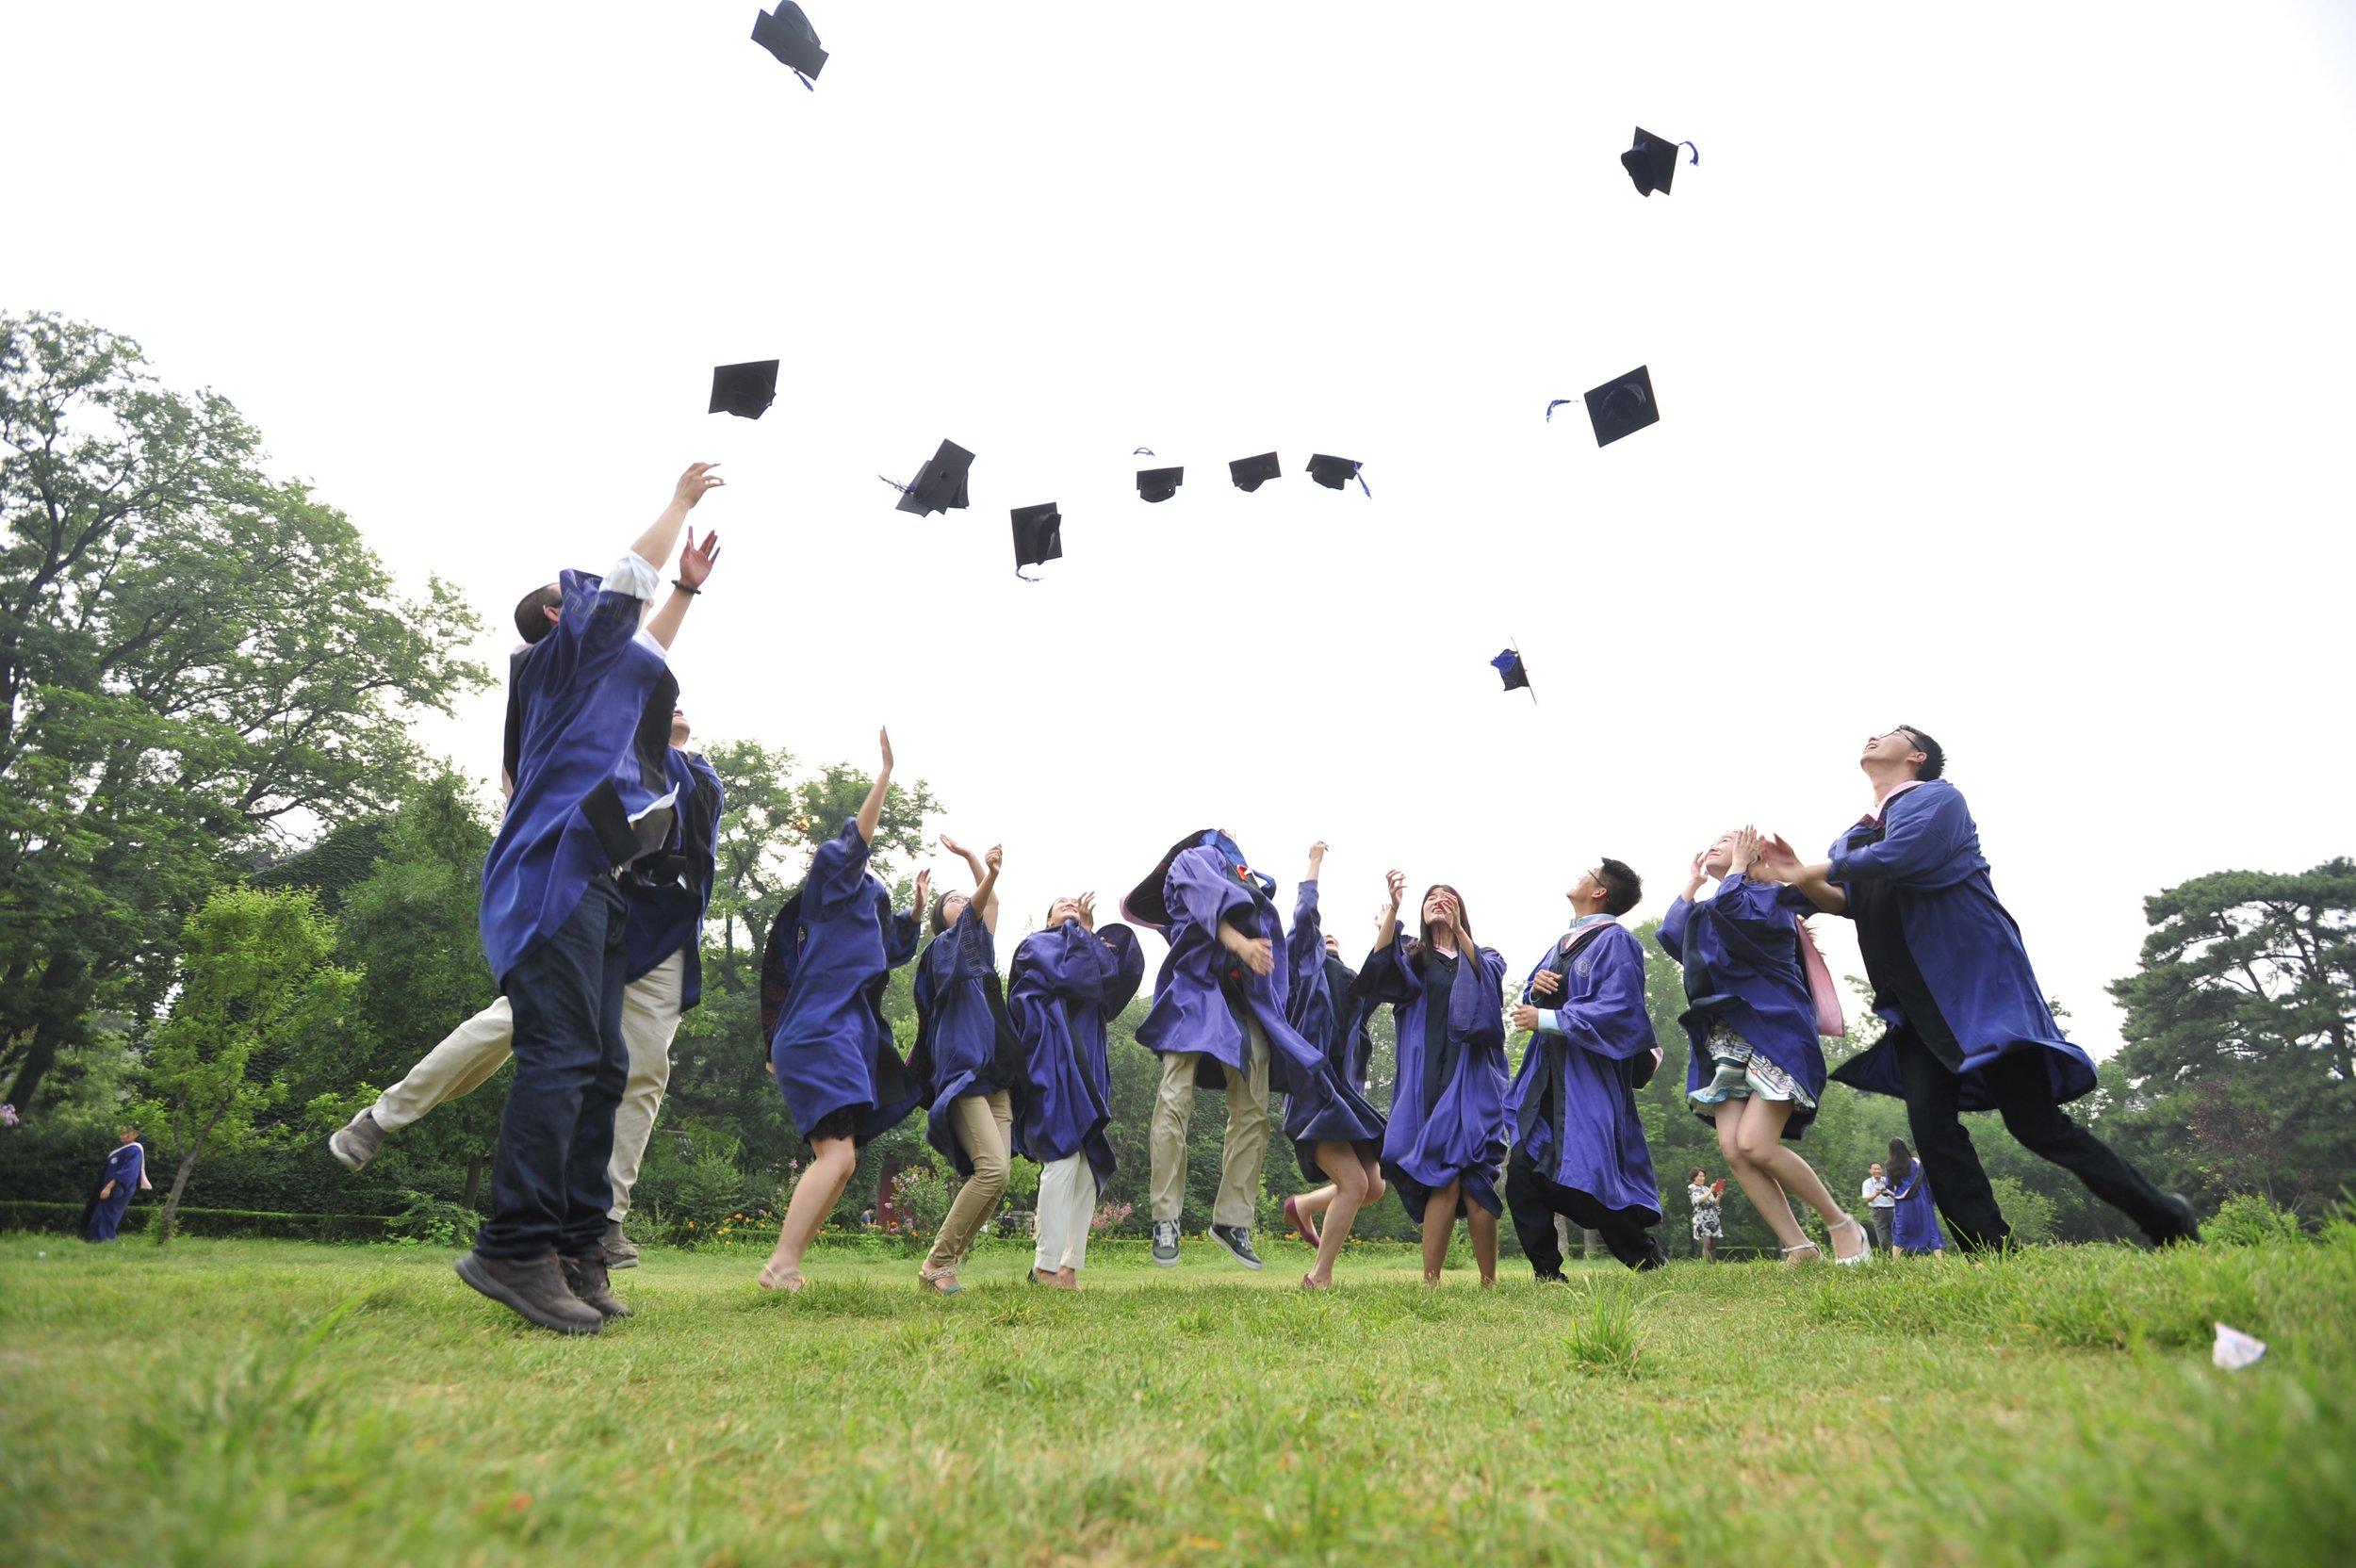 people-jumping-graduation-hats-dr-750137-pxhere.com.jpg